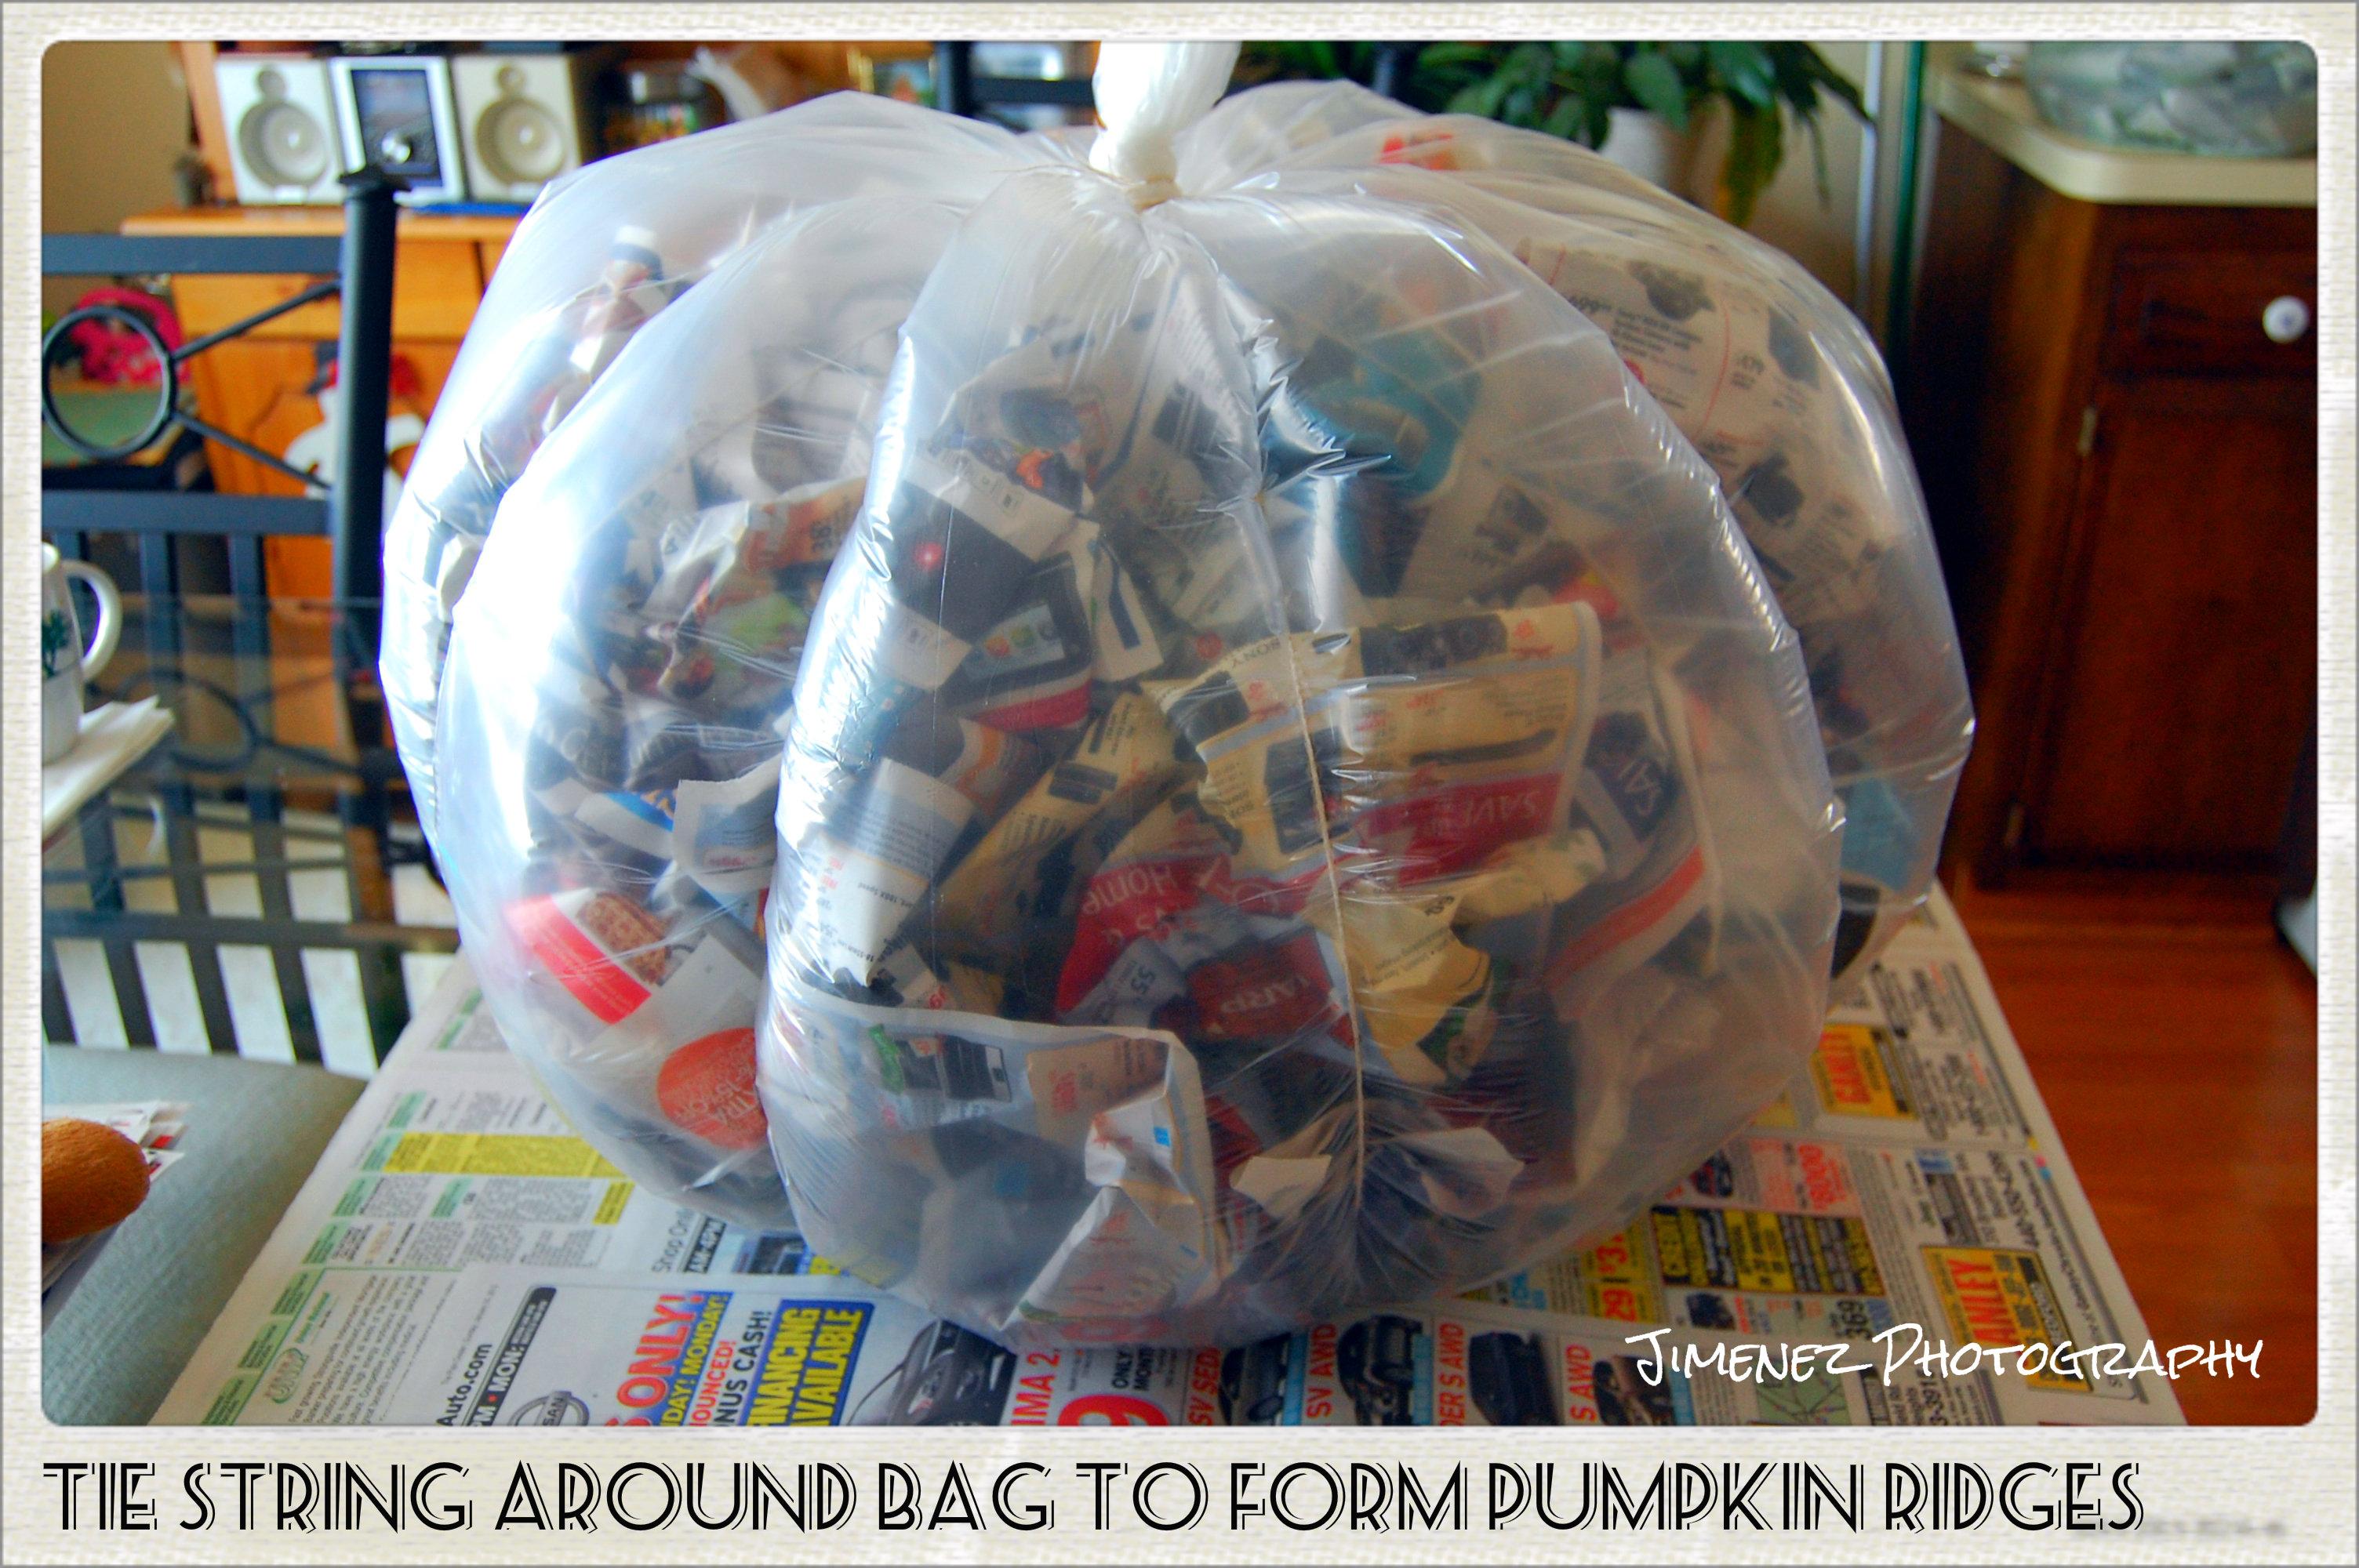 tie string around bag to form pumpkin - Large Plastic Pumpkins